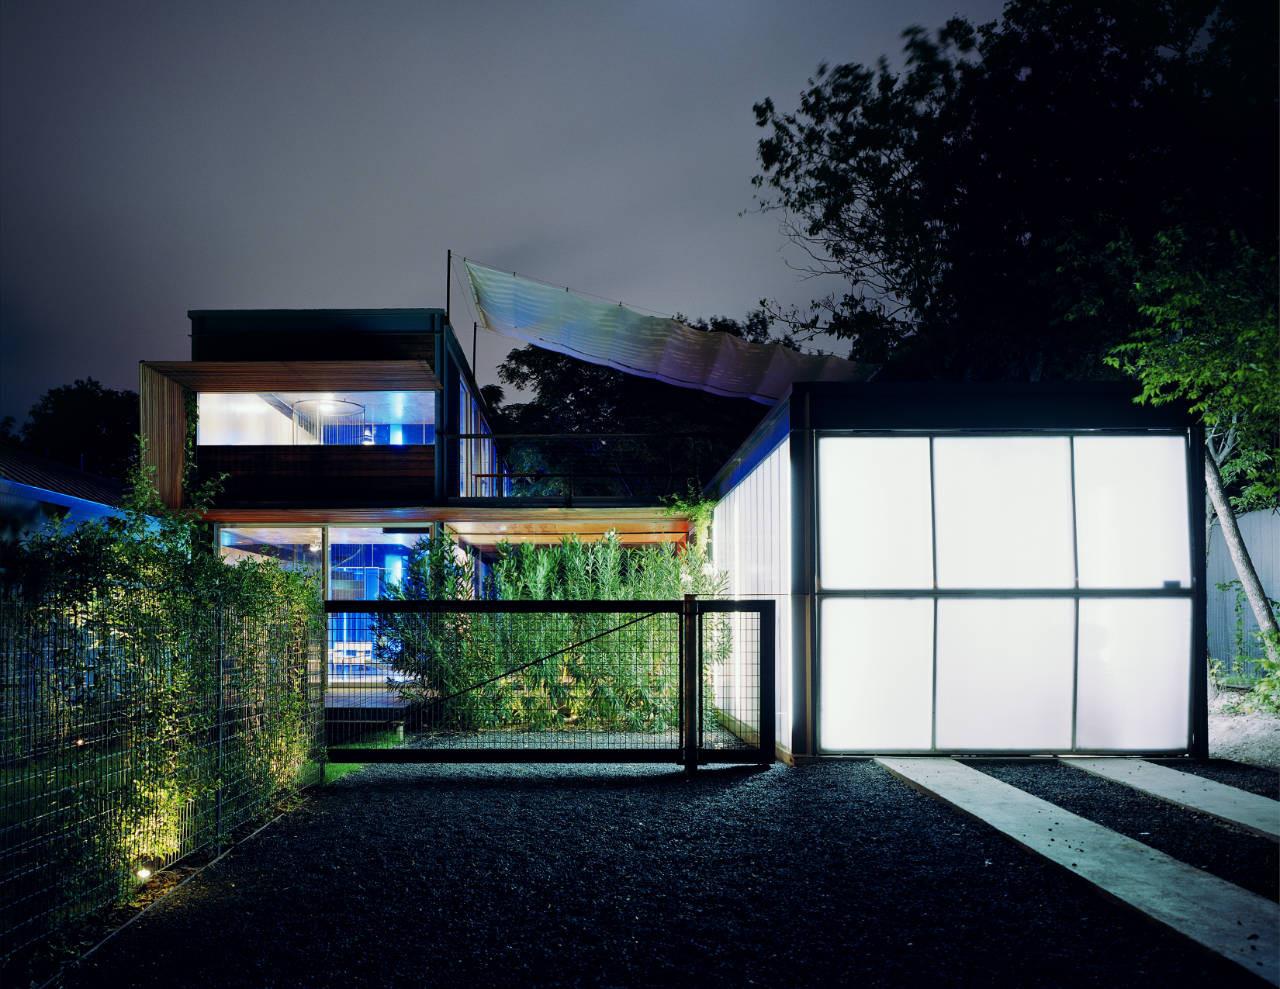 ^ Gallery of nnie esidence / Bercy hen Studio - 4